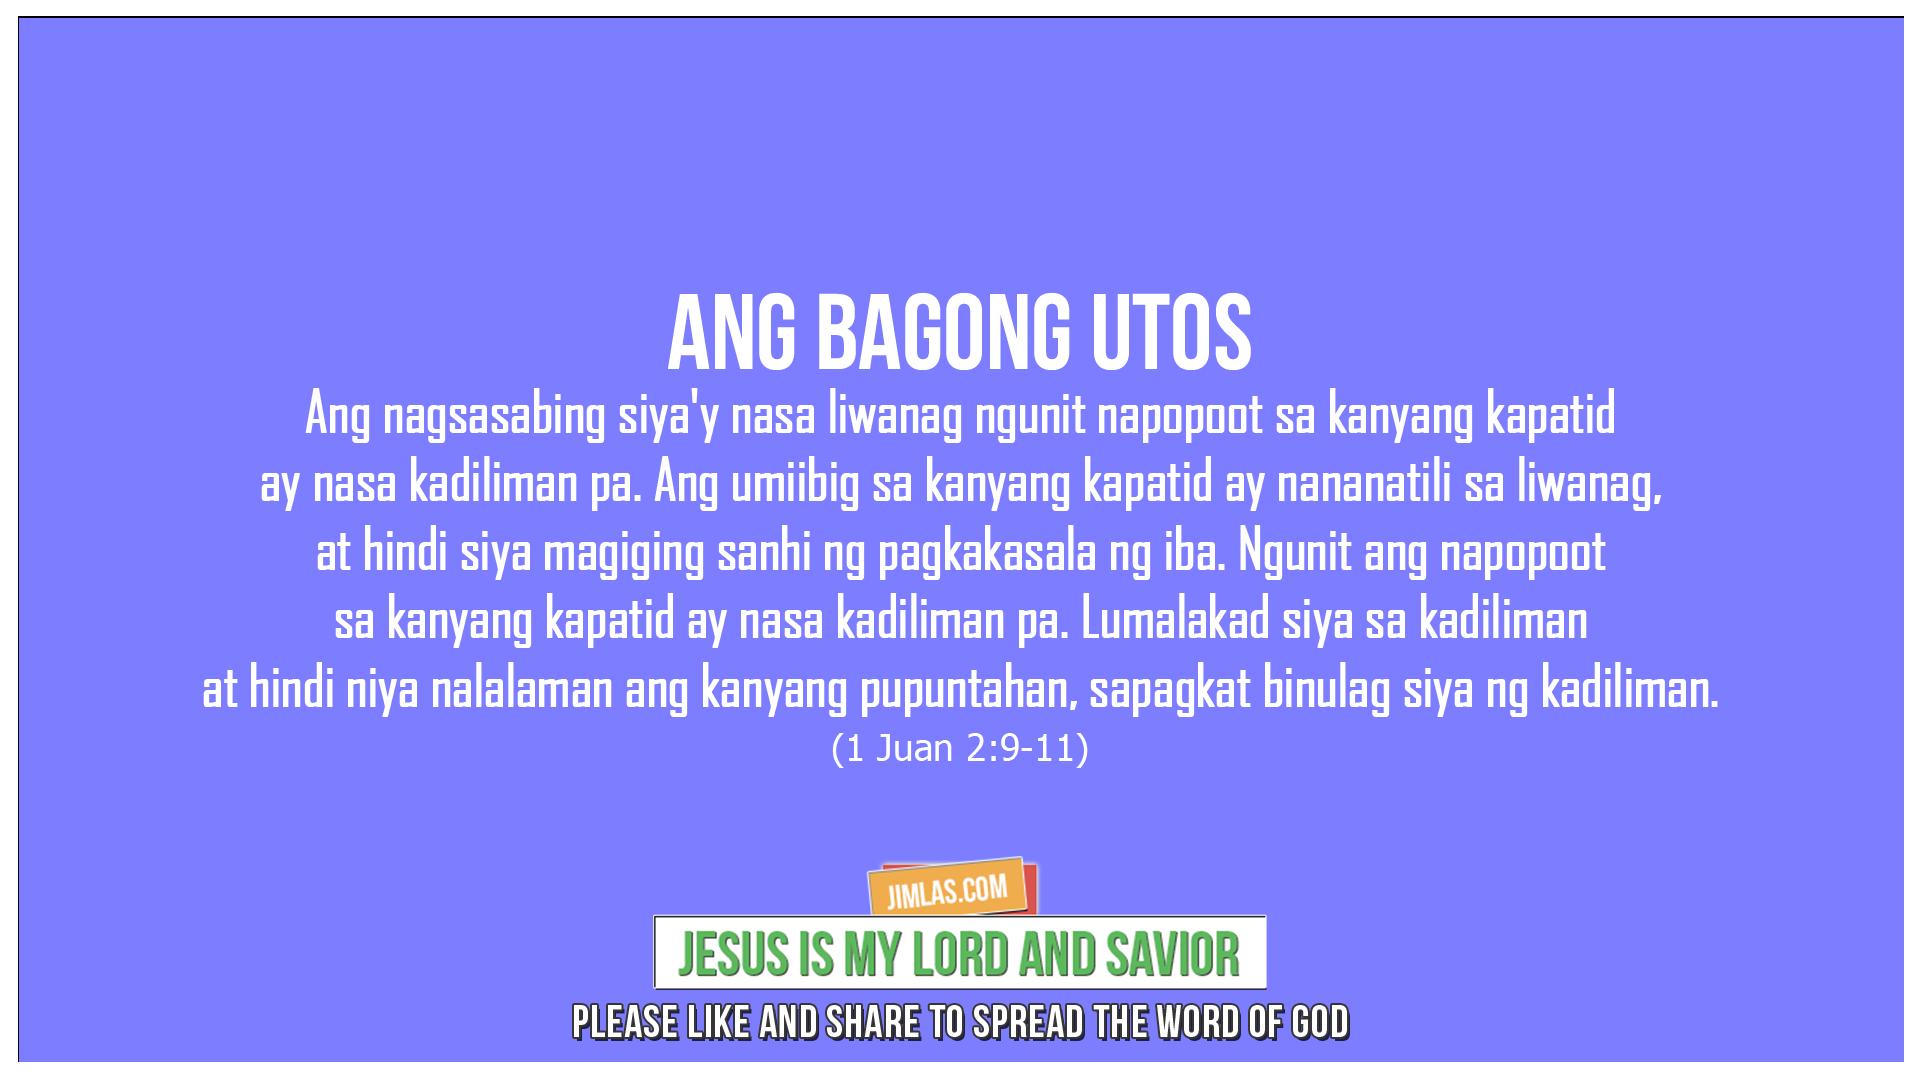 1 Juan 2:9-11, 1 Juan 2:9-11